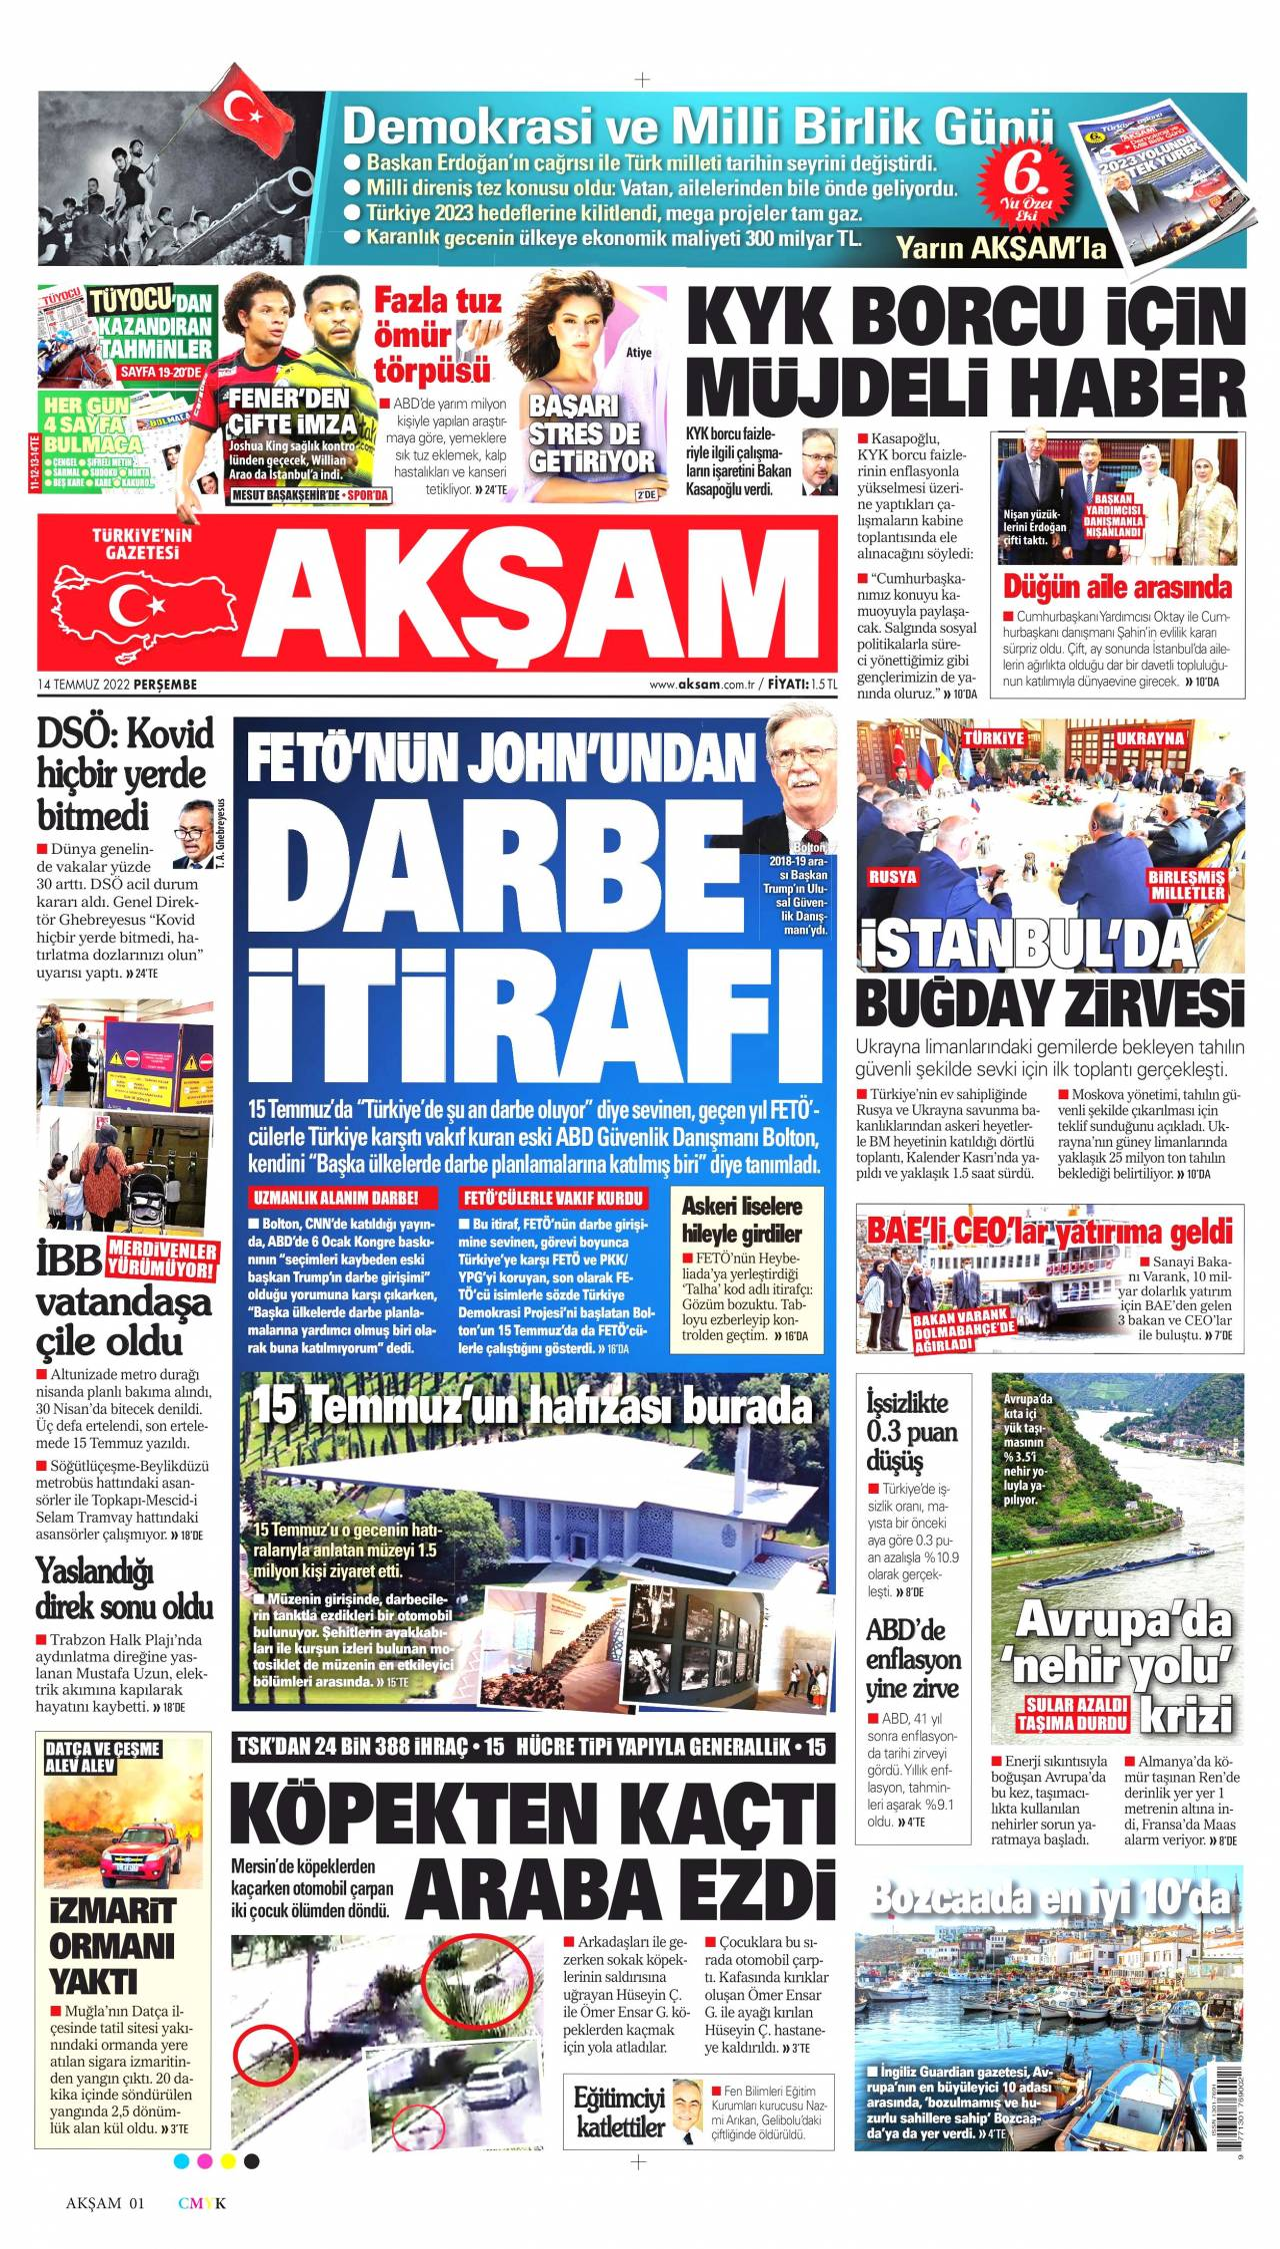 aksam Gazetesi